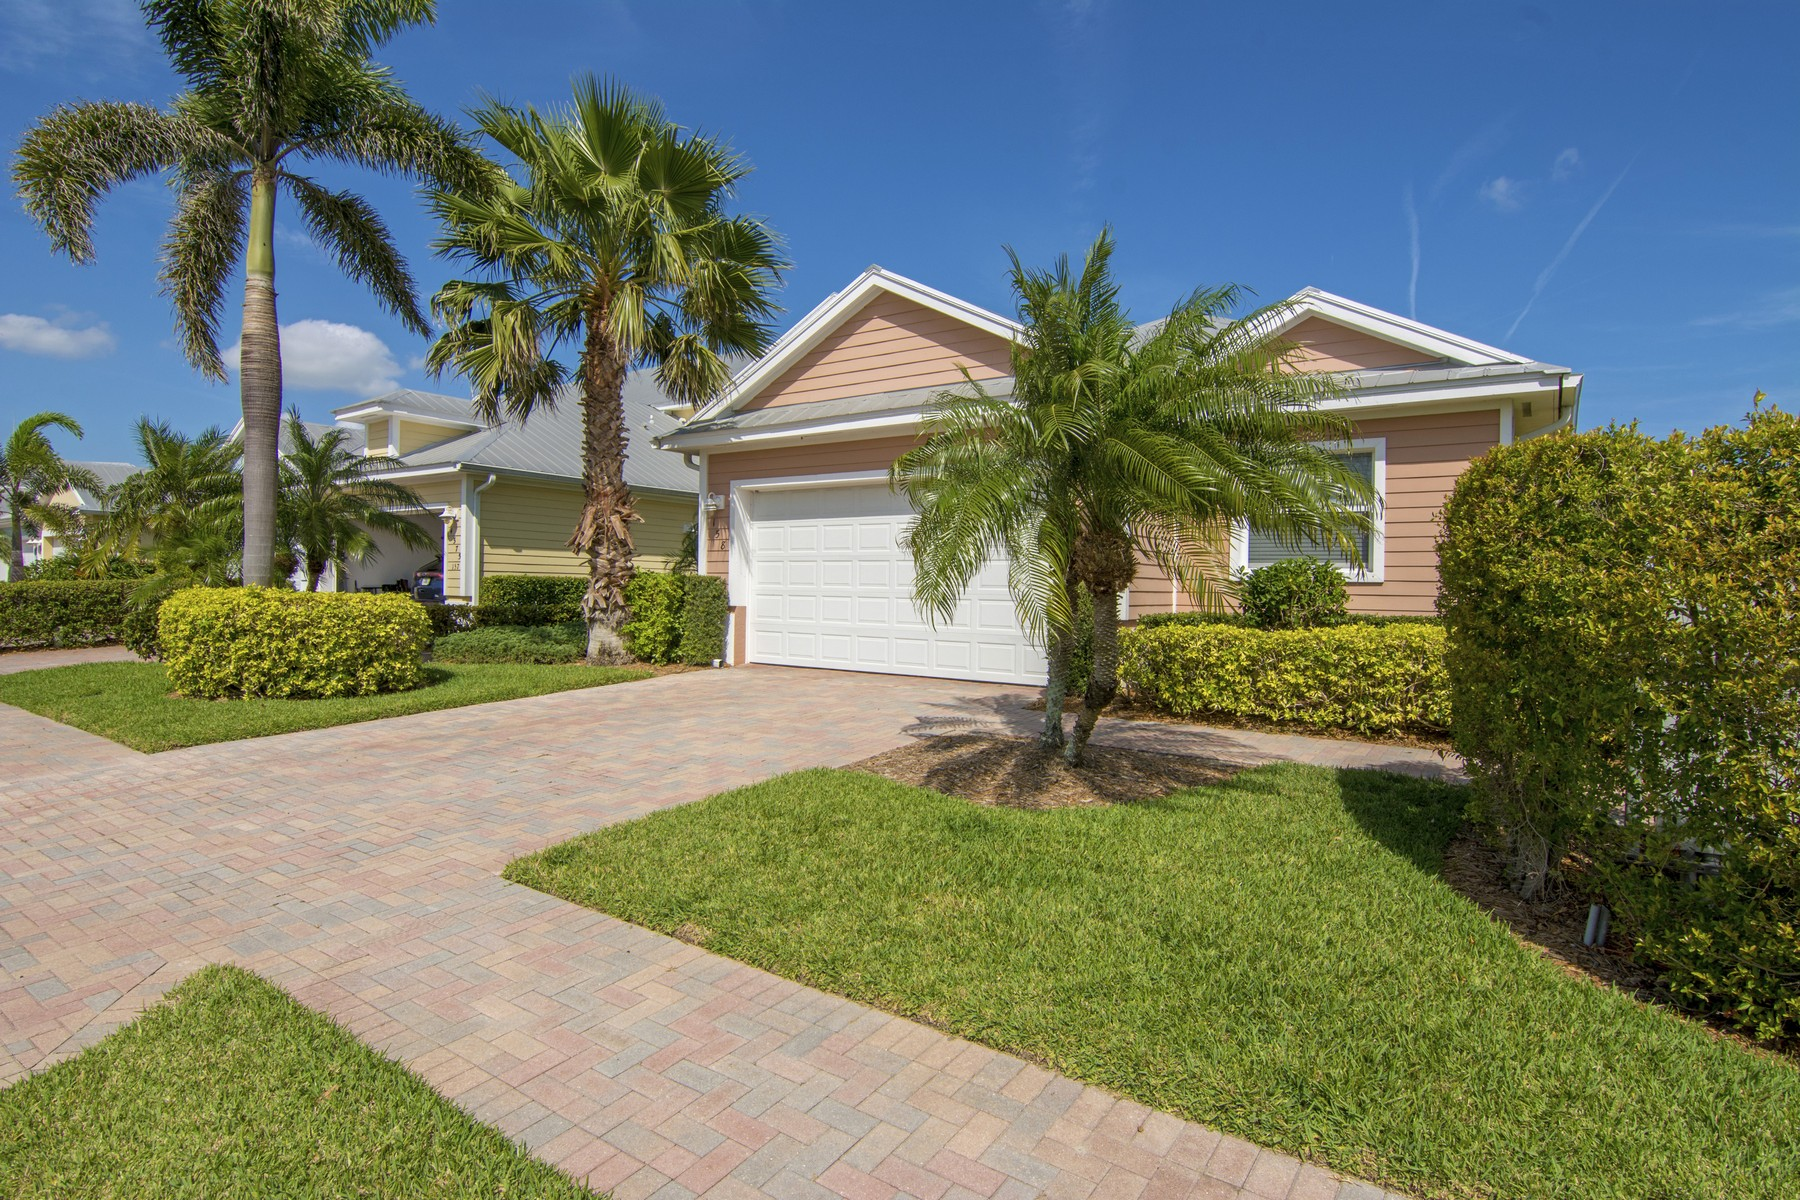 独户住宅 为 销售 在 YOUR NEW HOME OR VACATION GETAWAY 4575 Bridgepointe Way #158, 维罗海滩, 佛罗里达州, 32967 美国